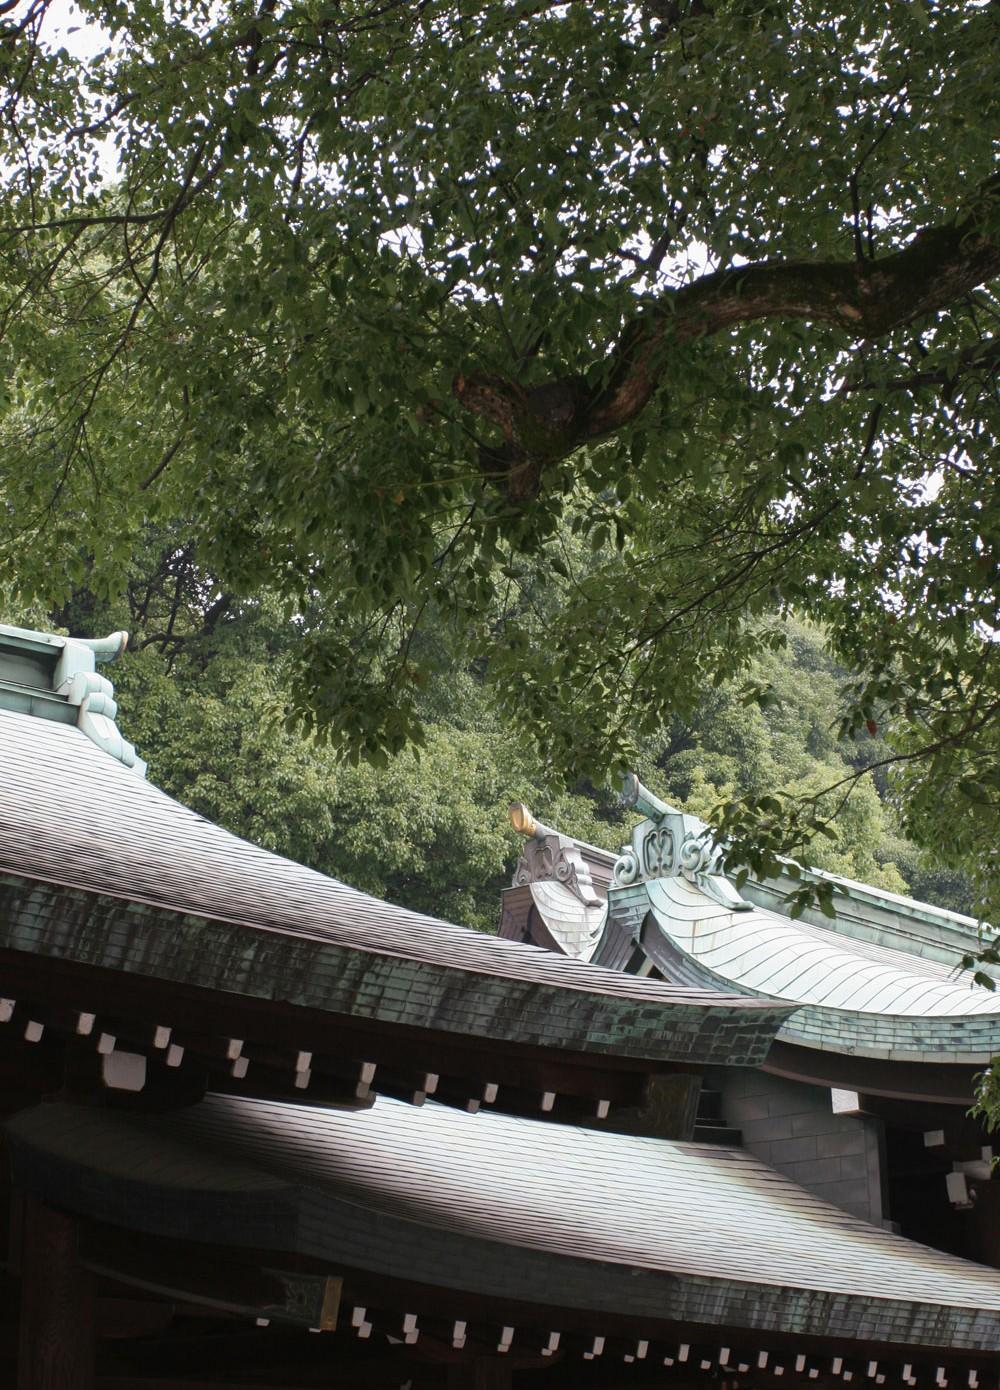 Toitures du sanctuaire Meiji de Tokyo